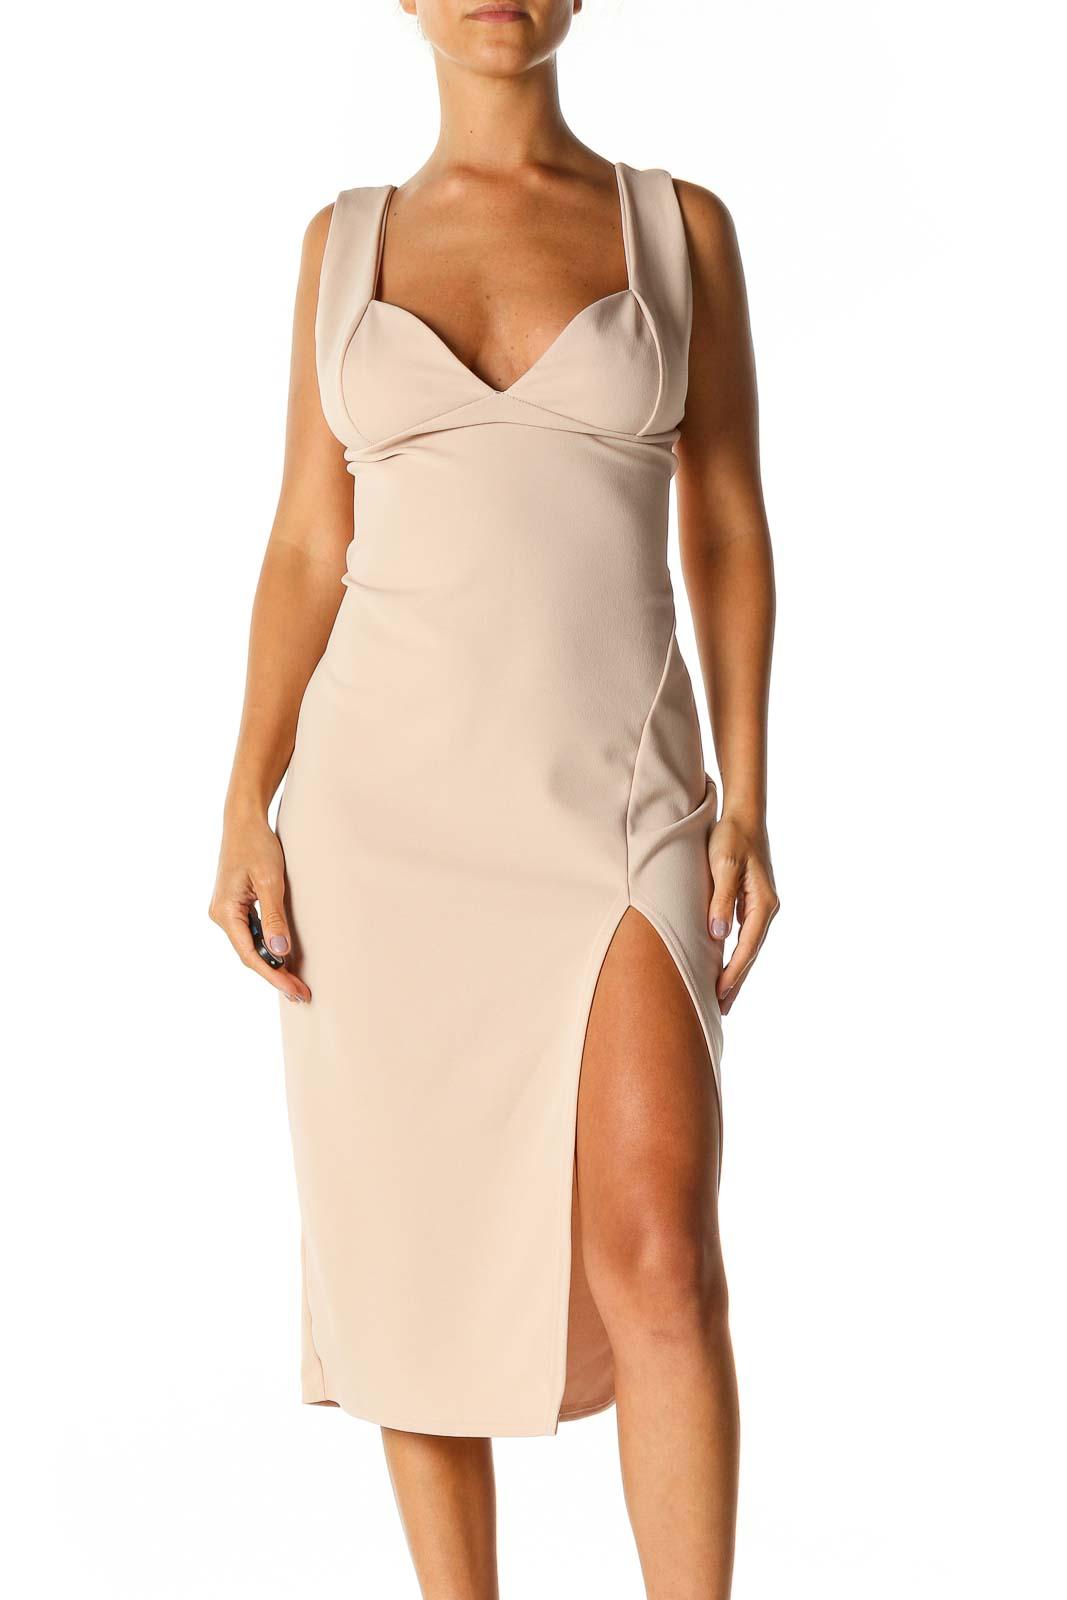 Beige Solid Sheath Dress Front